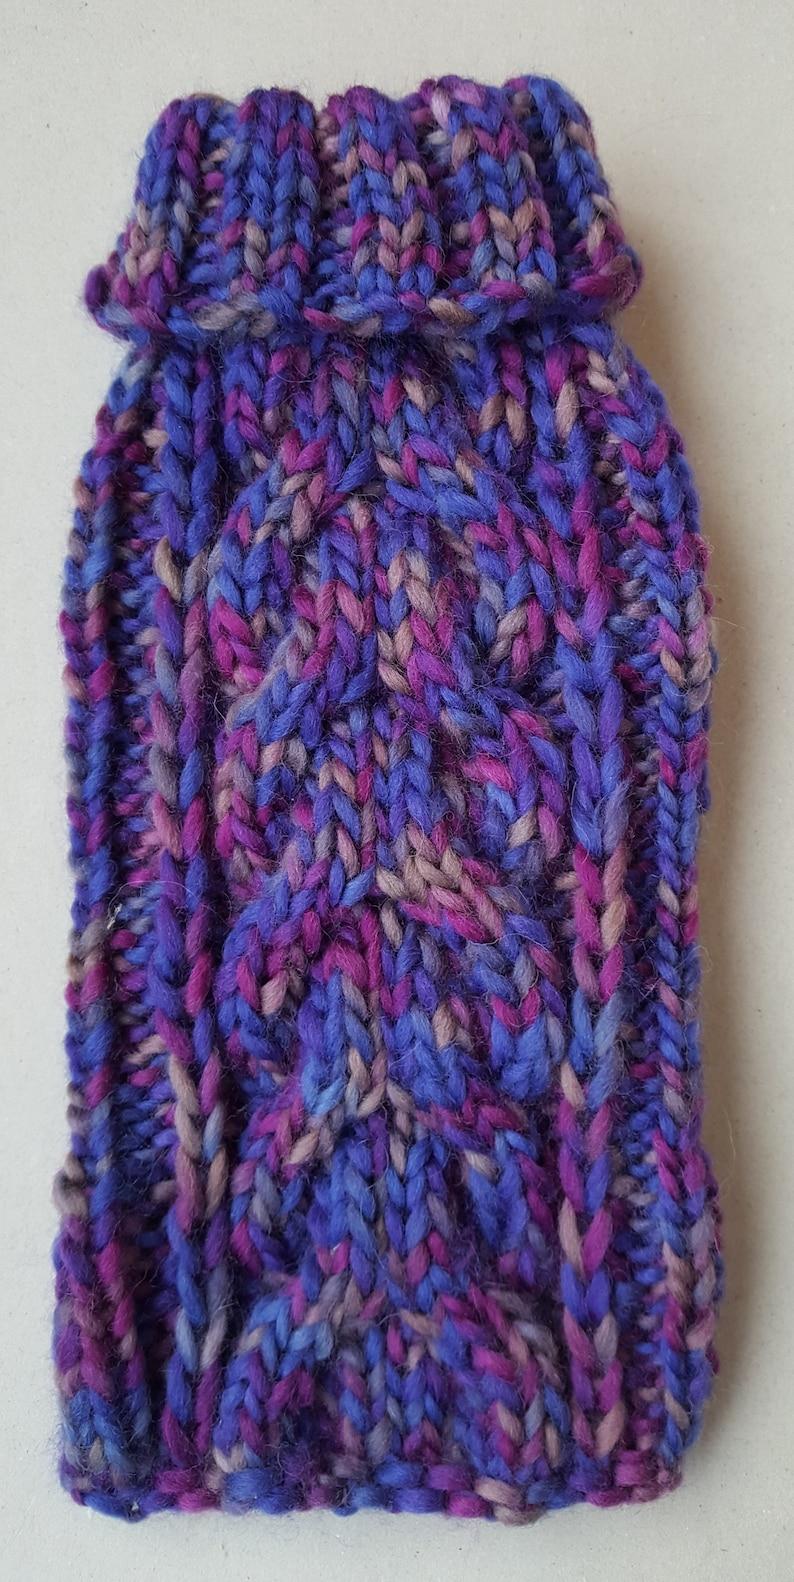 Hand Knit Dog Sweater Small Dog Sweater-Chihuahua sweater-Pet Sweater-Dog Costume Multiple sizes